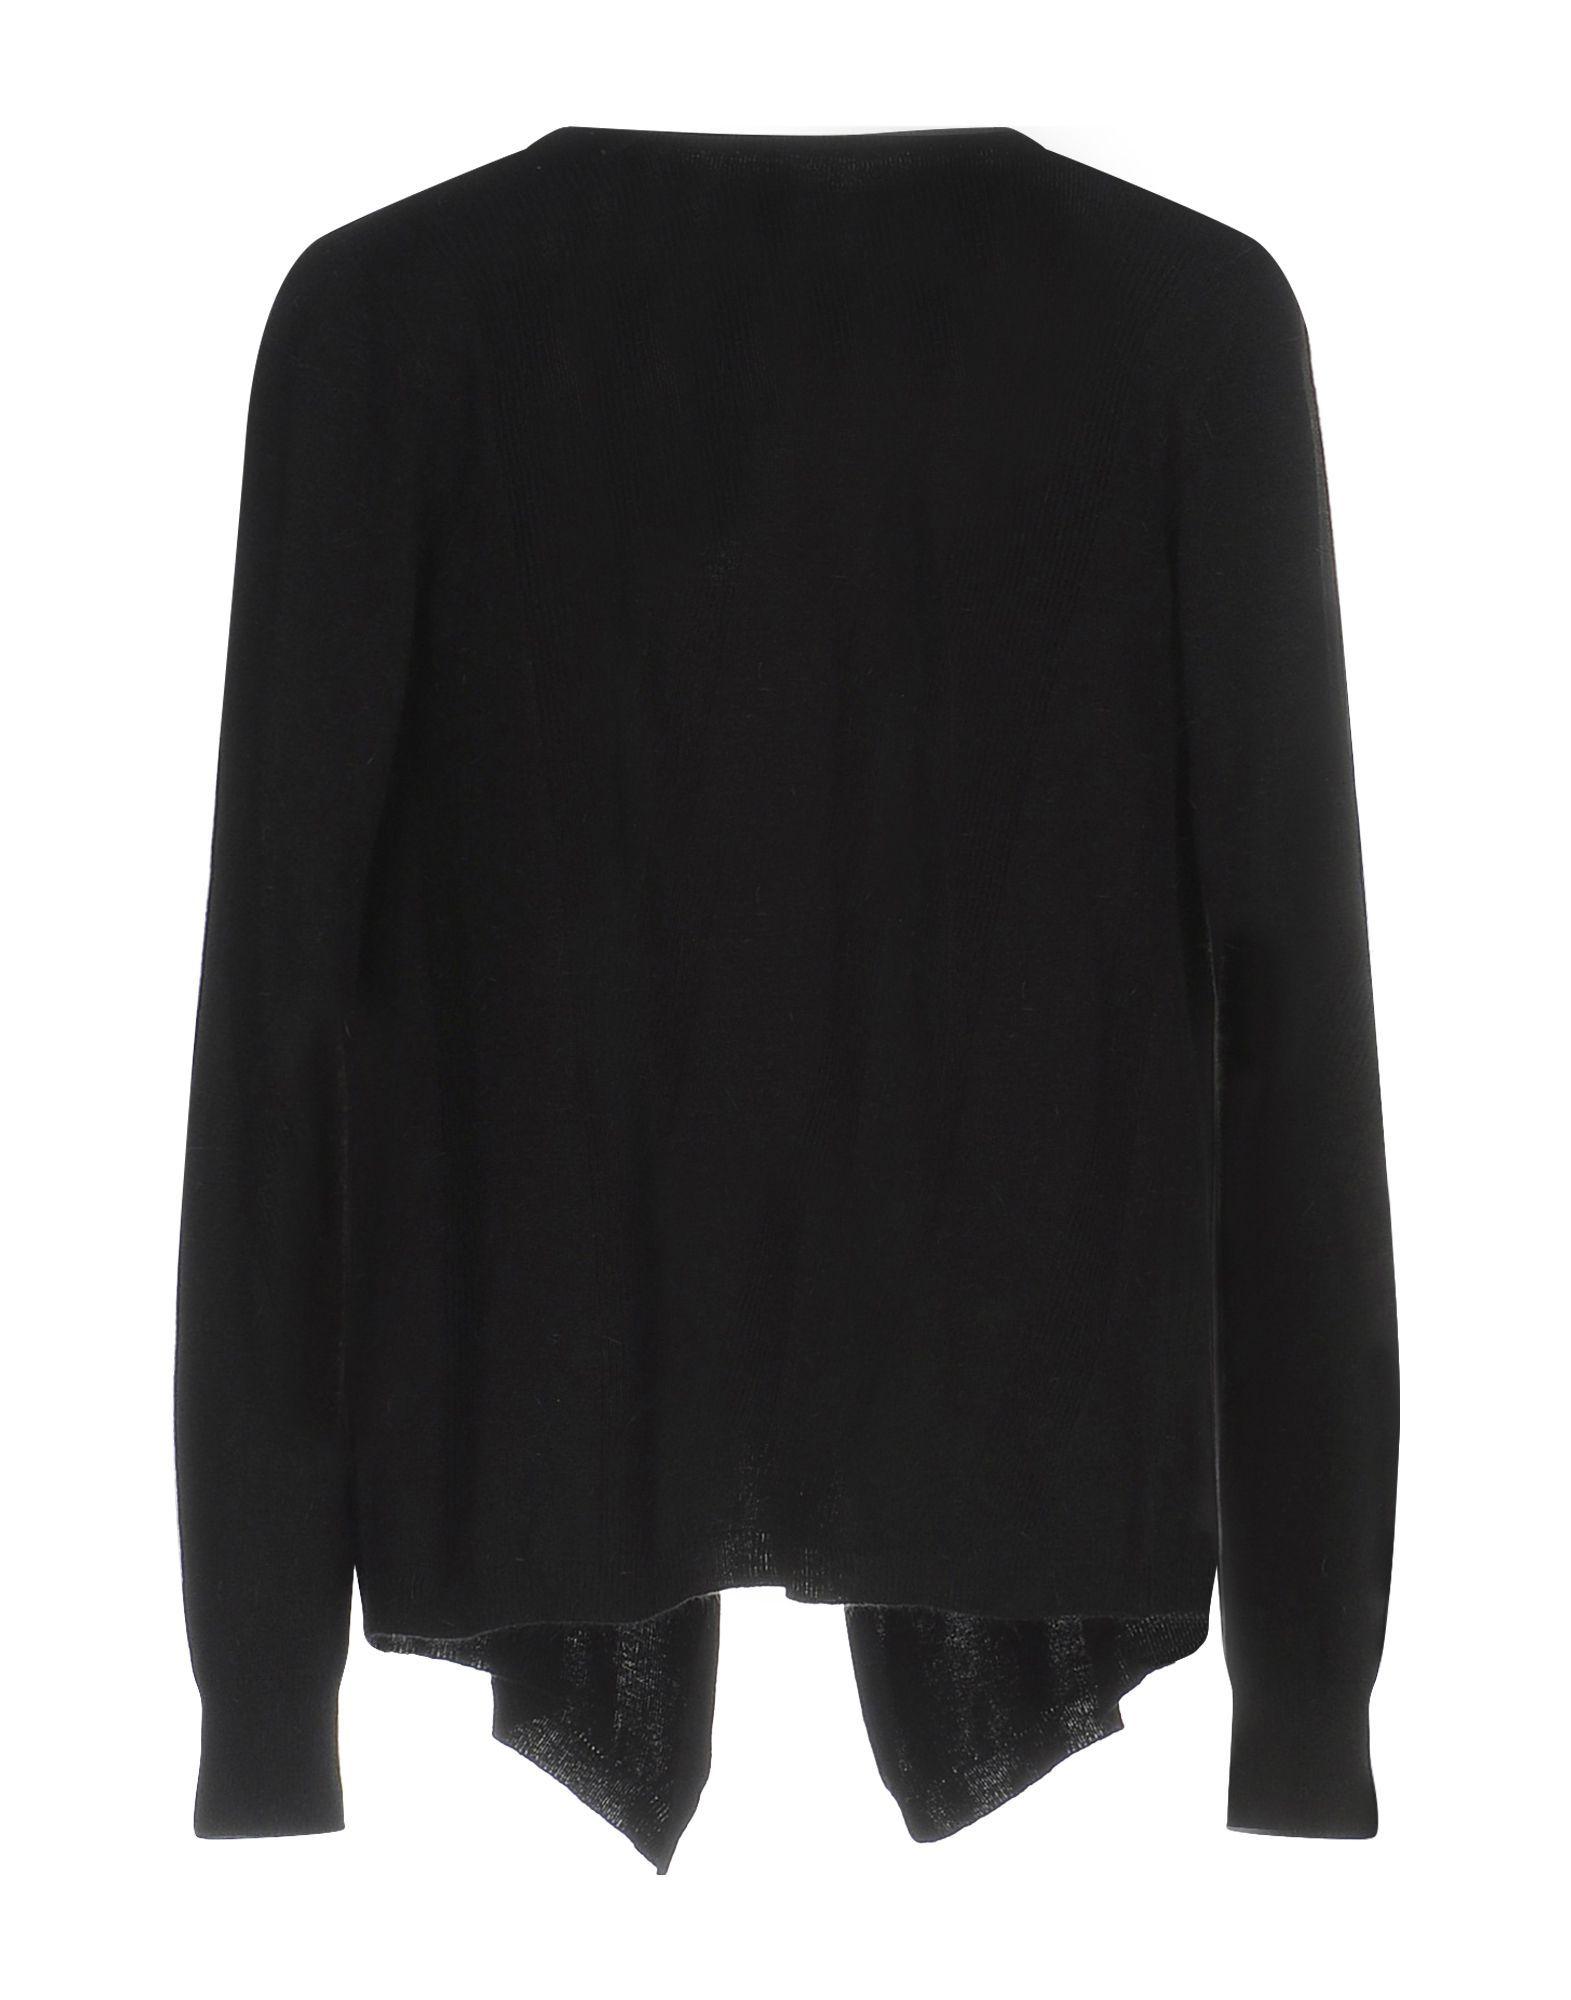 Pepe Jeans Black Knit Cardigan